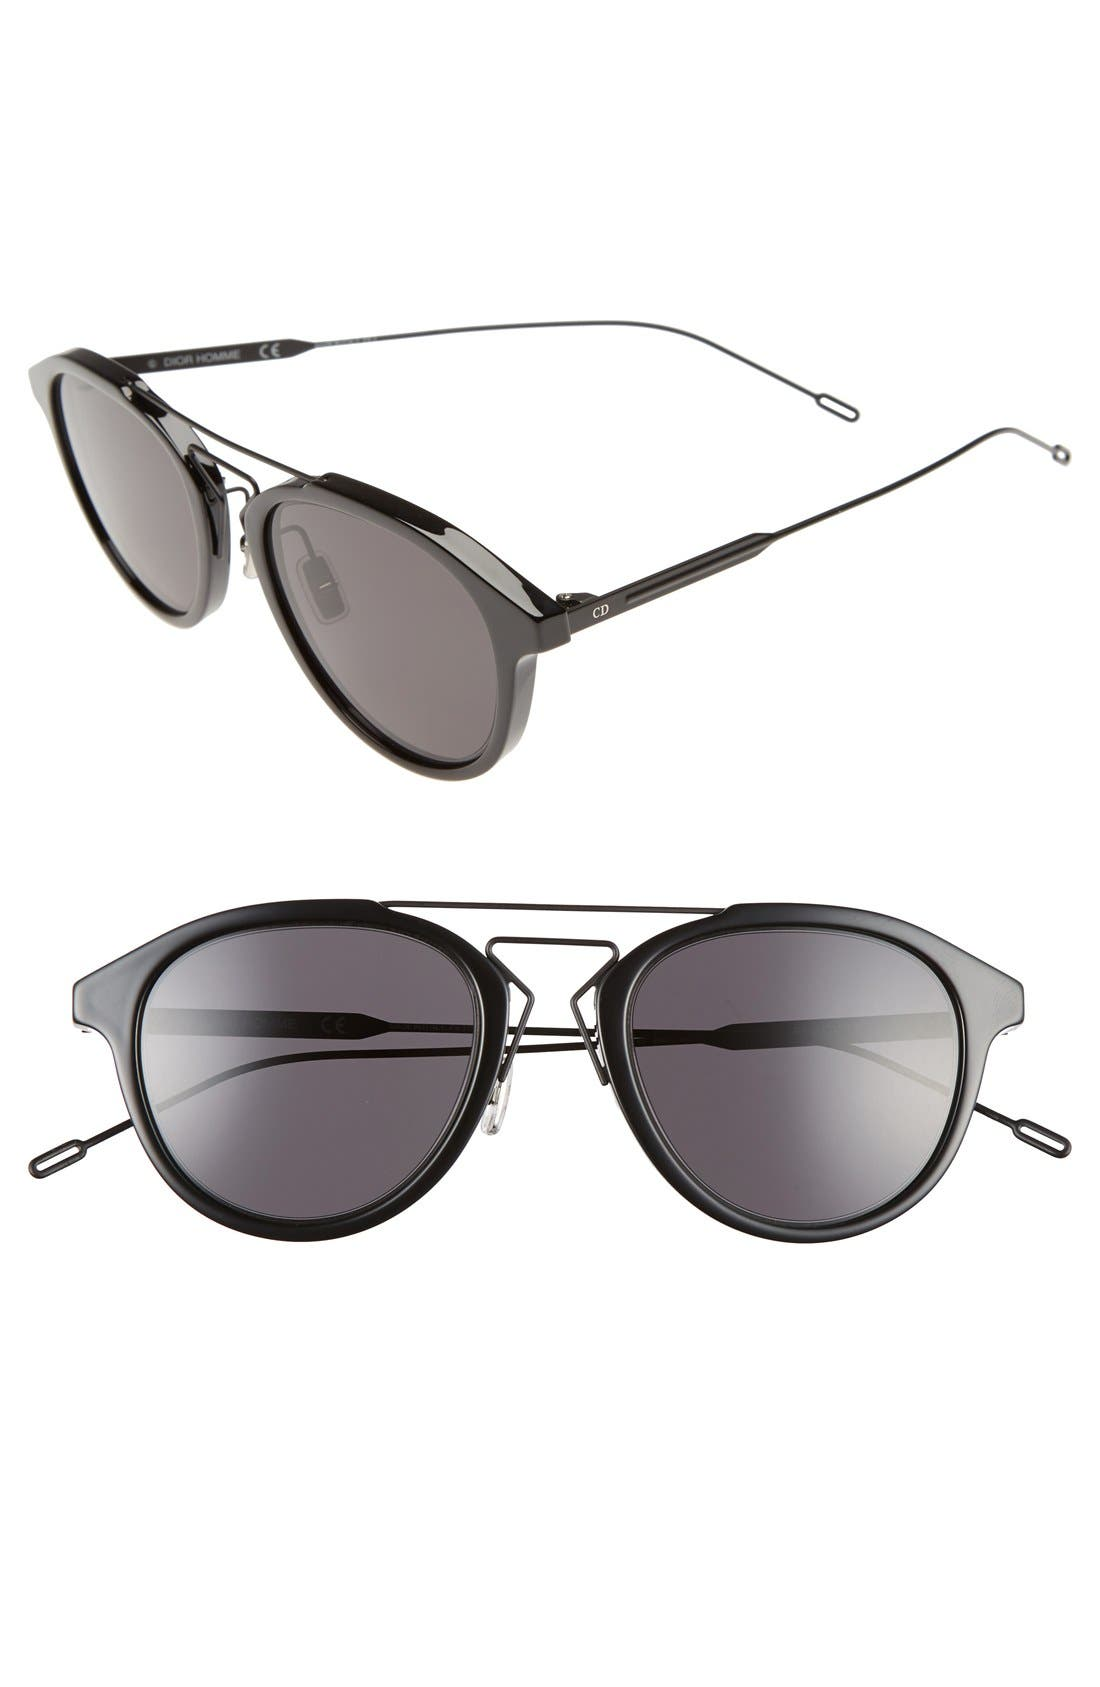 Dior 'Black Tie' 51mm Sunglasses,                             Main thumbnail 1, color,                             001